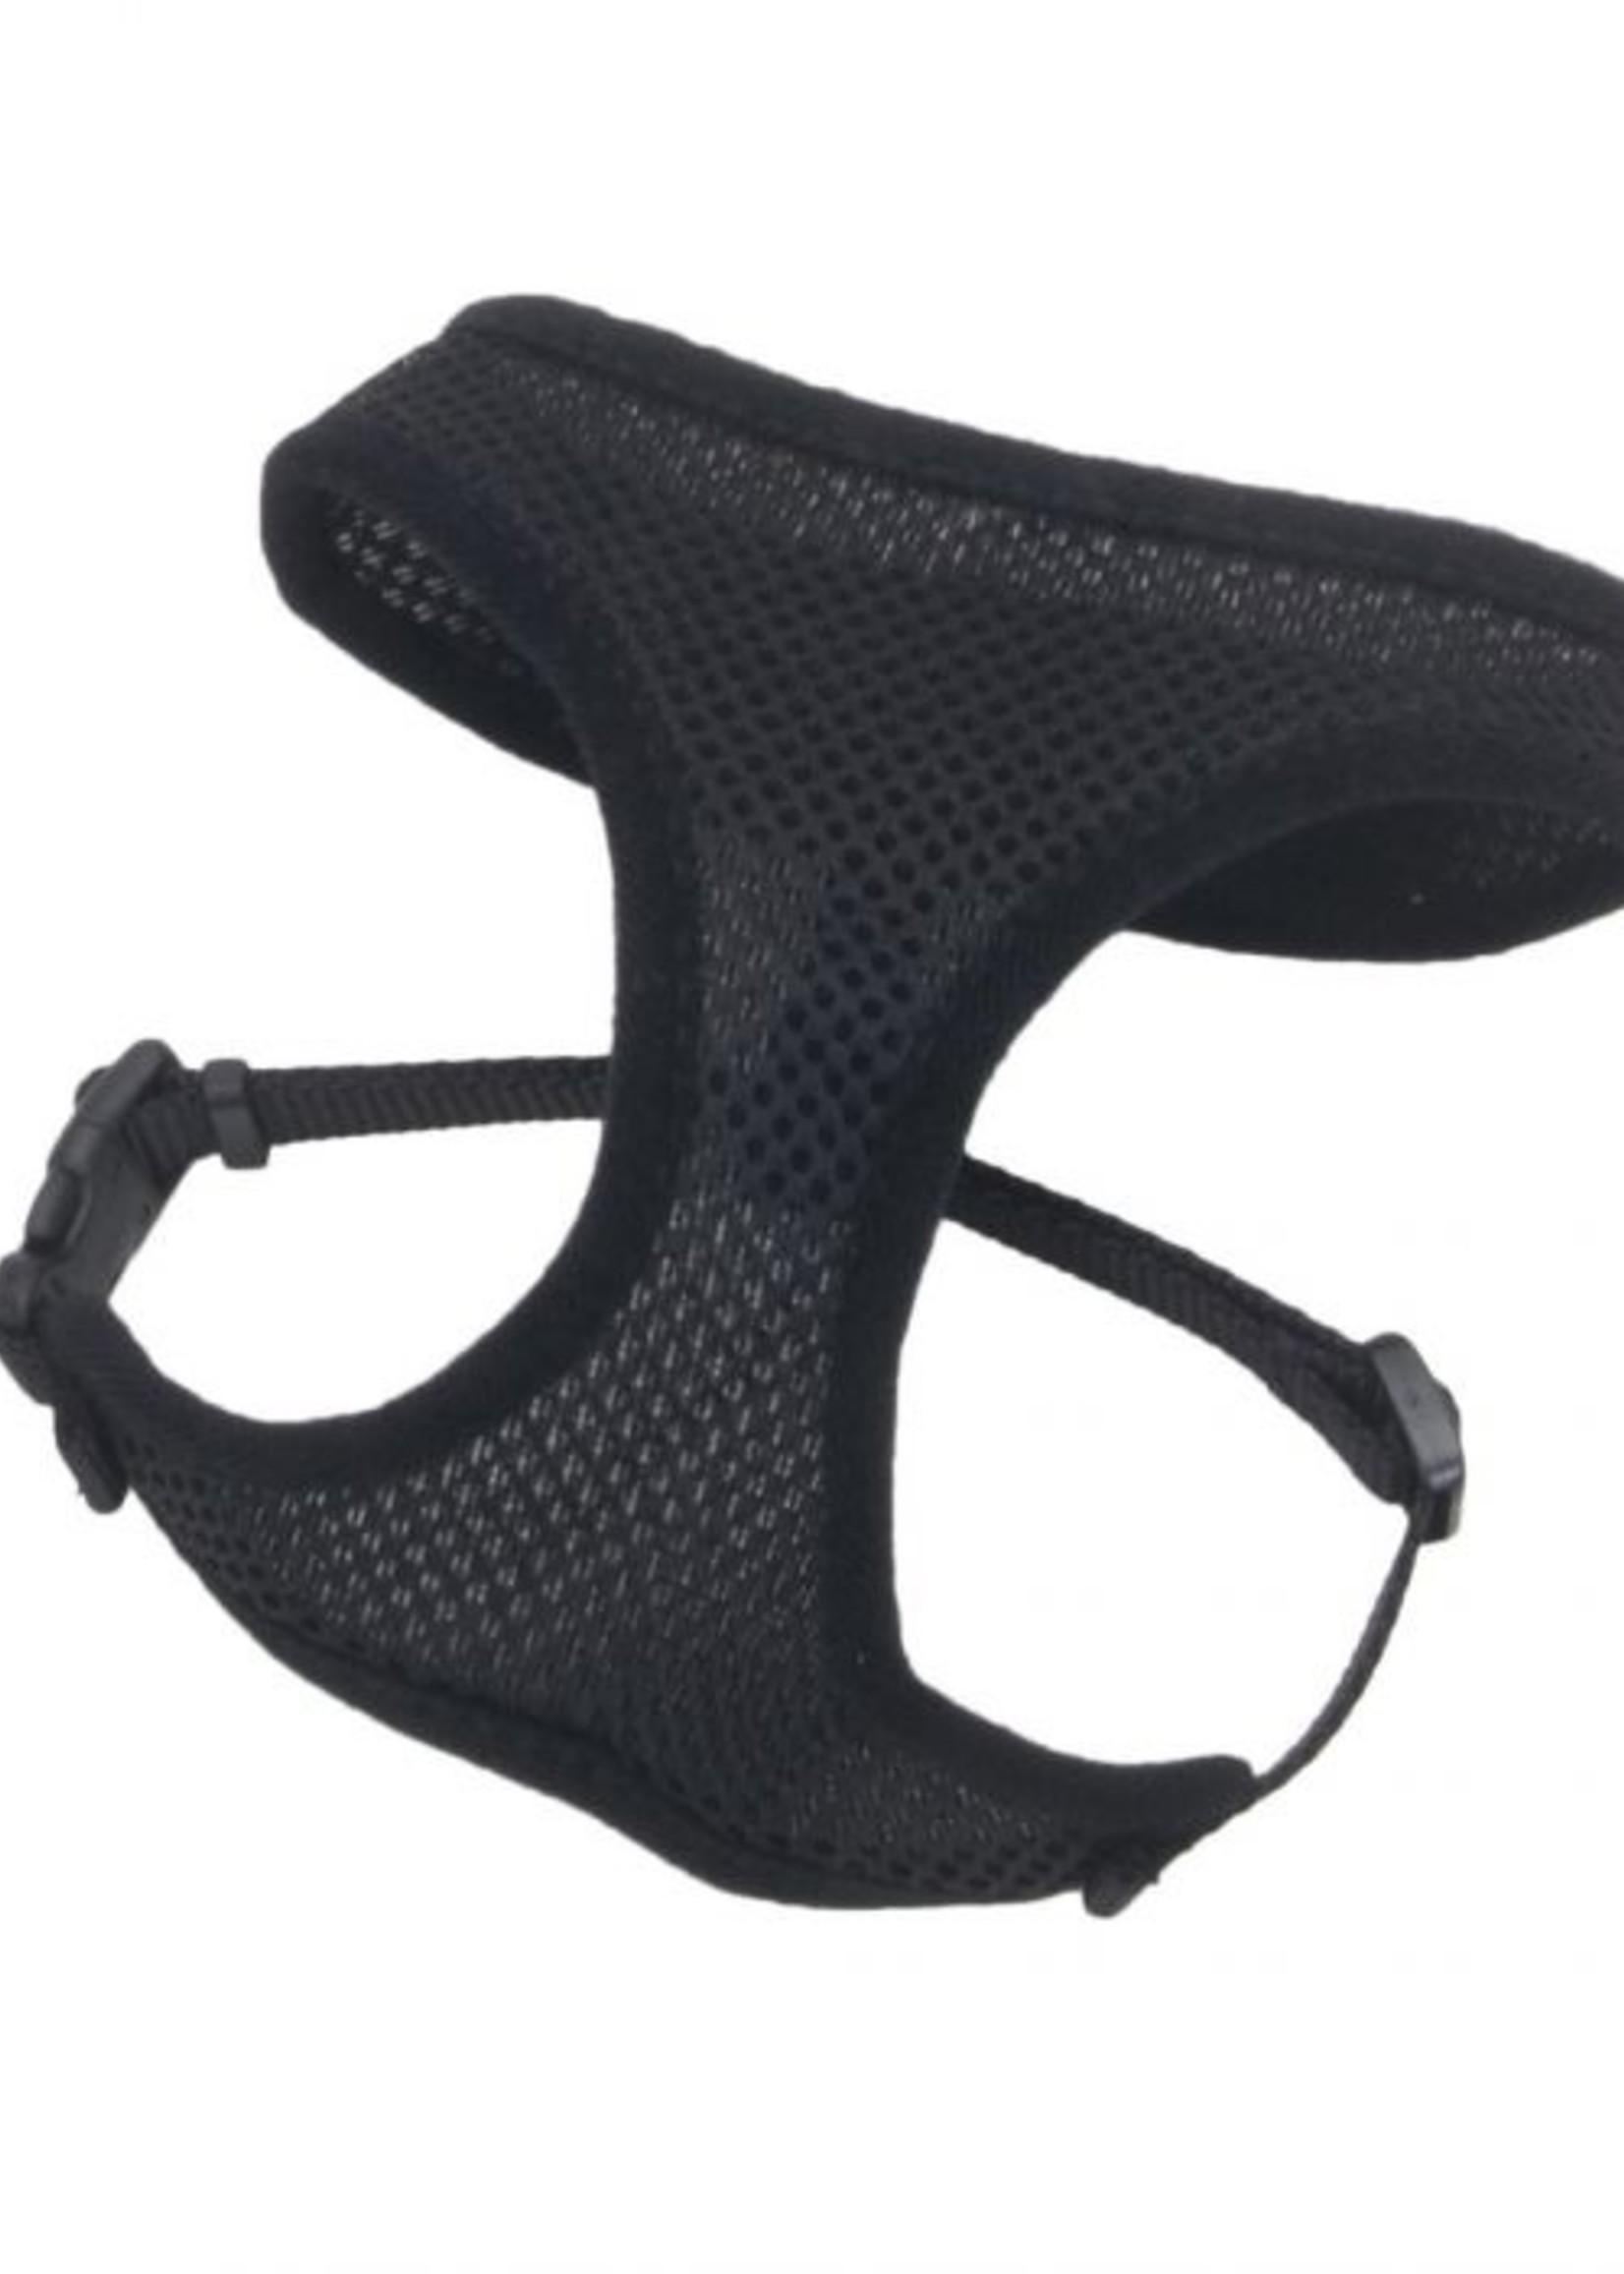 Comfort Soft® Comfort Soft® Adjustable Harness Small